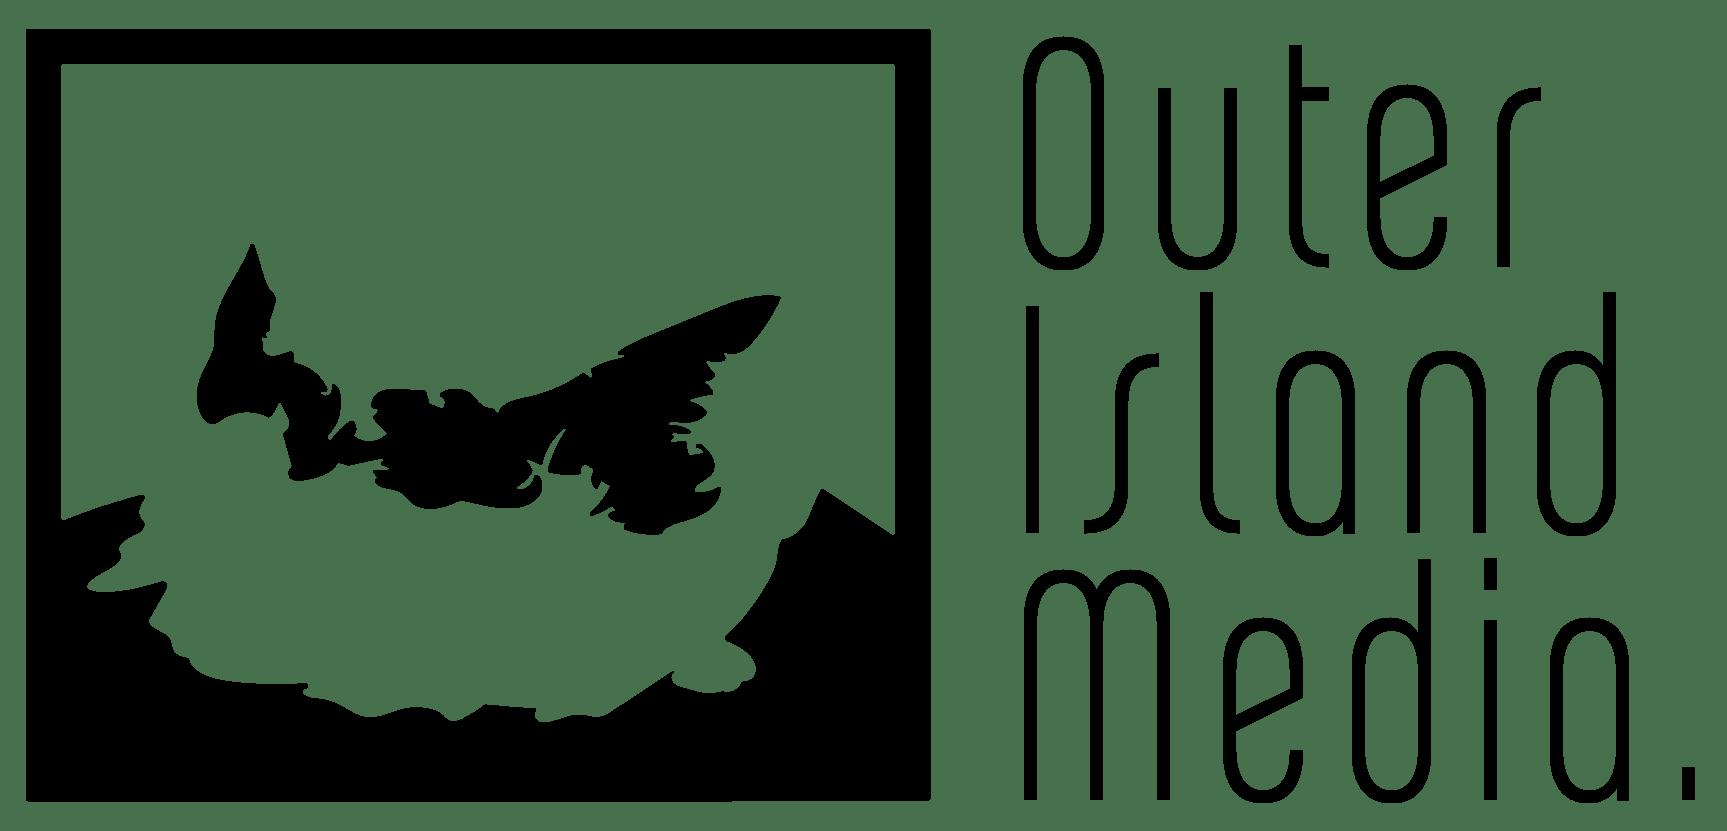 Outer Island Media